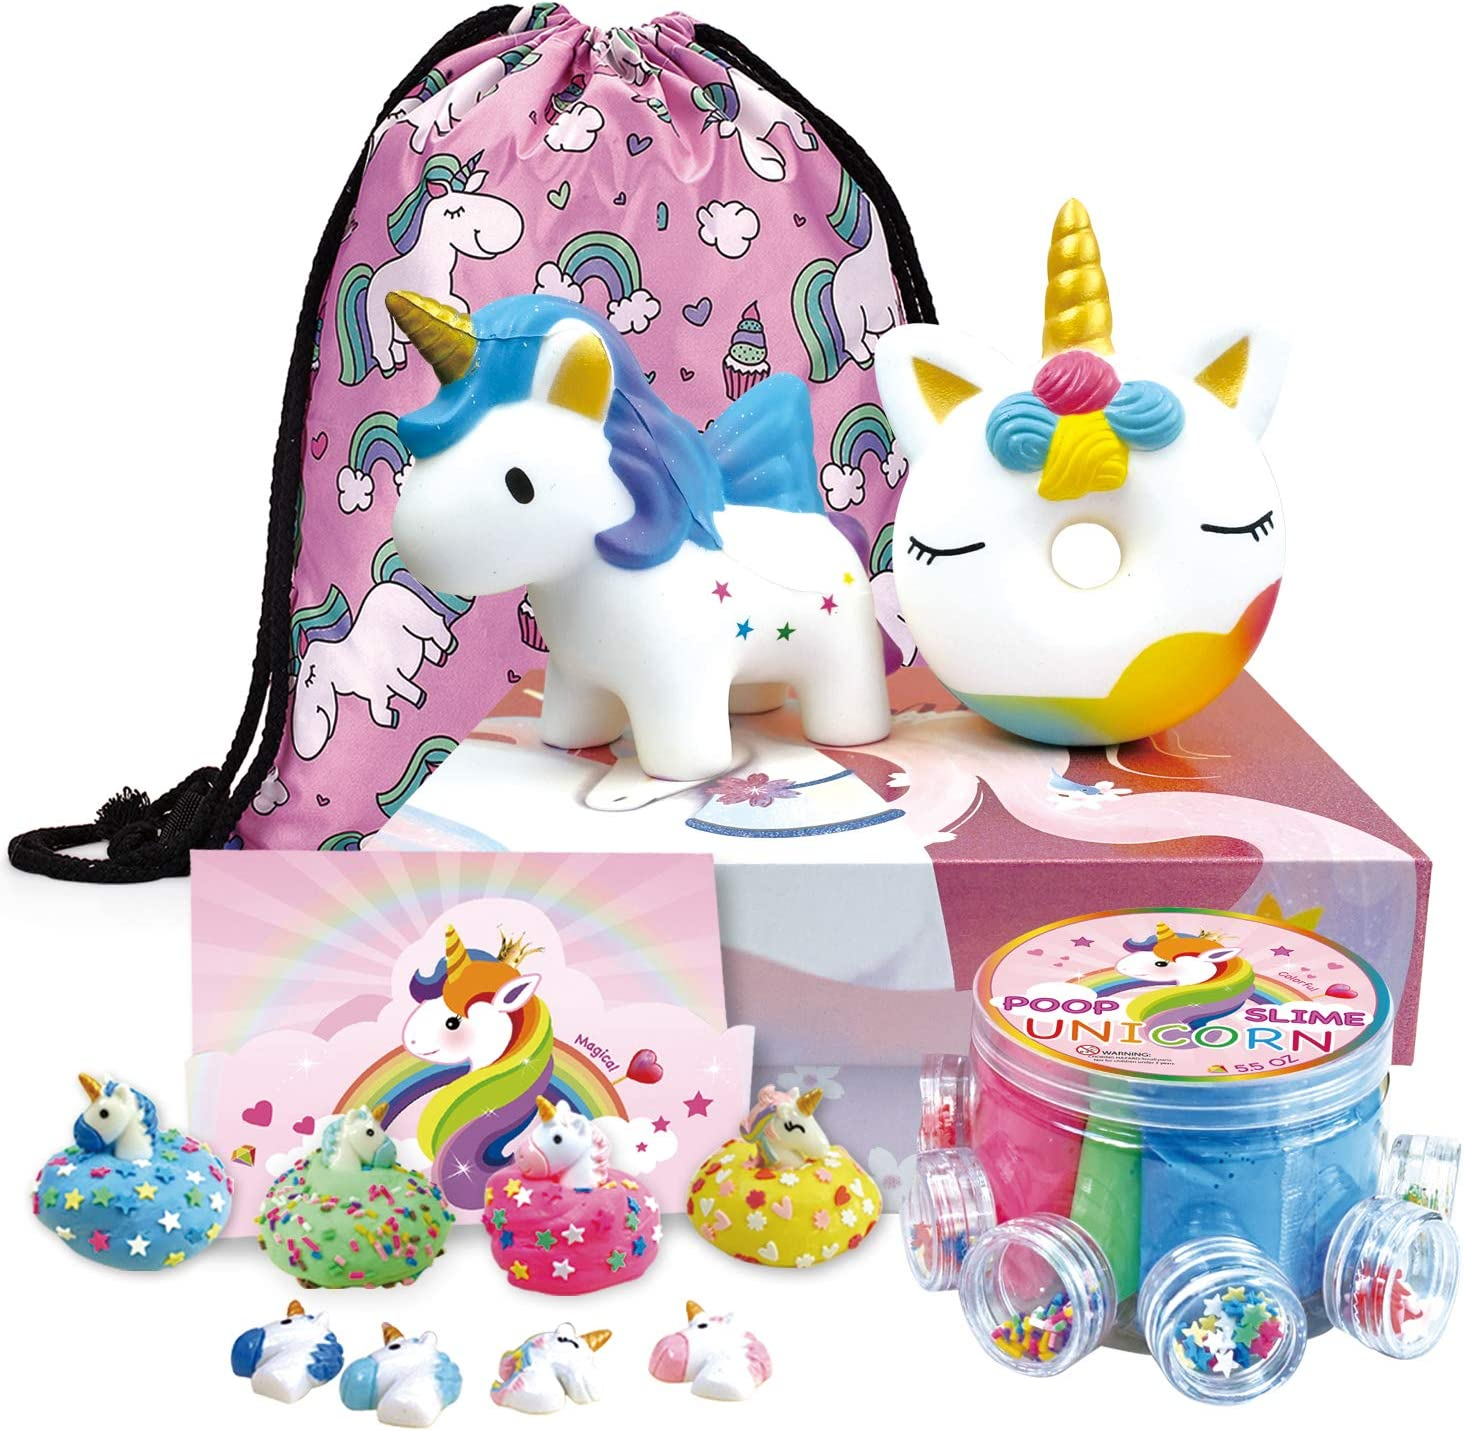 GB02694 Childrens Gift Box Cloud Nine Unicorn Money Bank